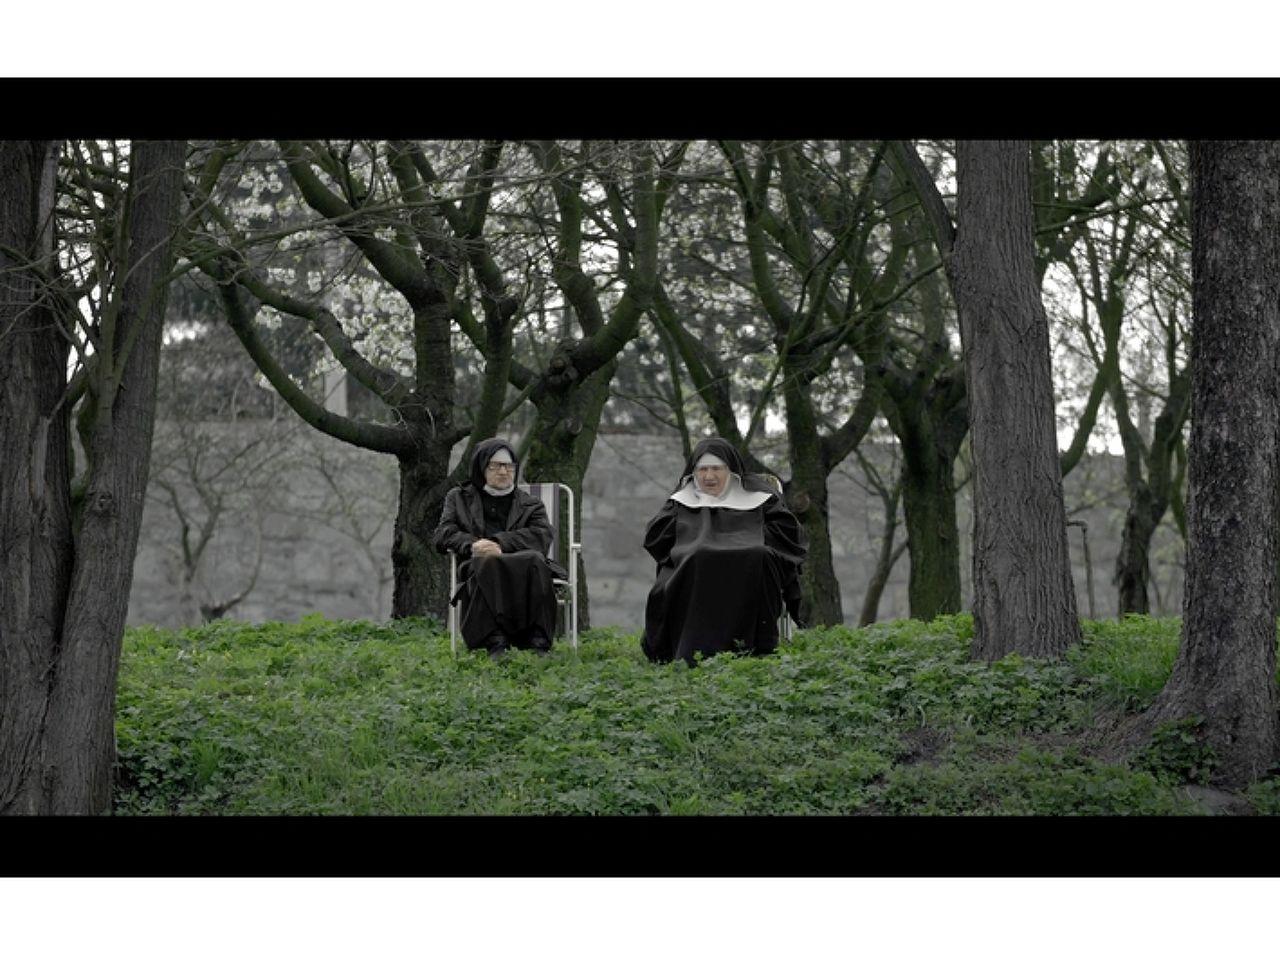 Lodz Film School: The Young Generation // MOCAK